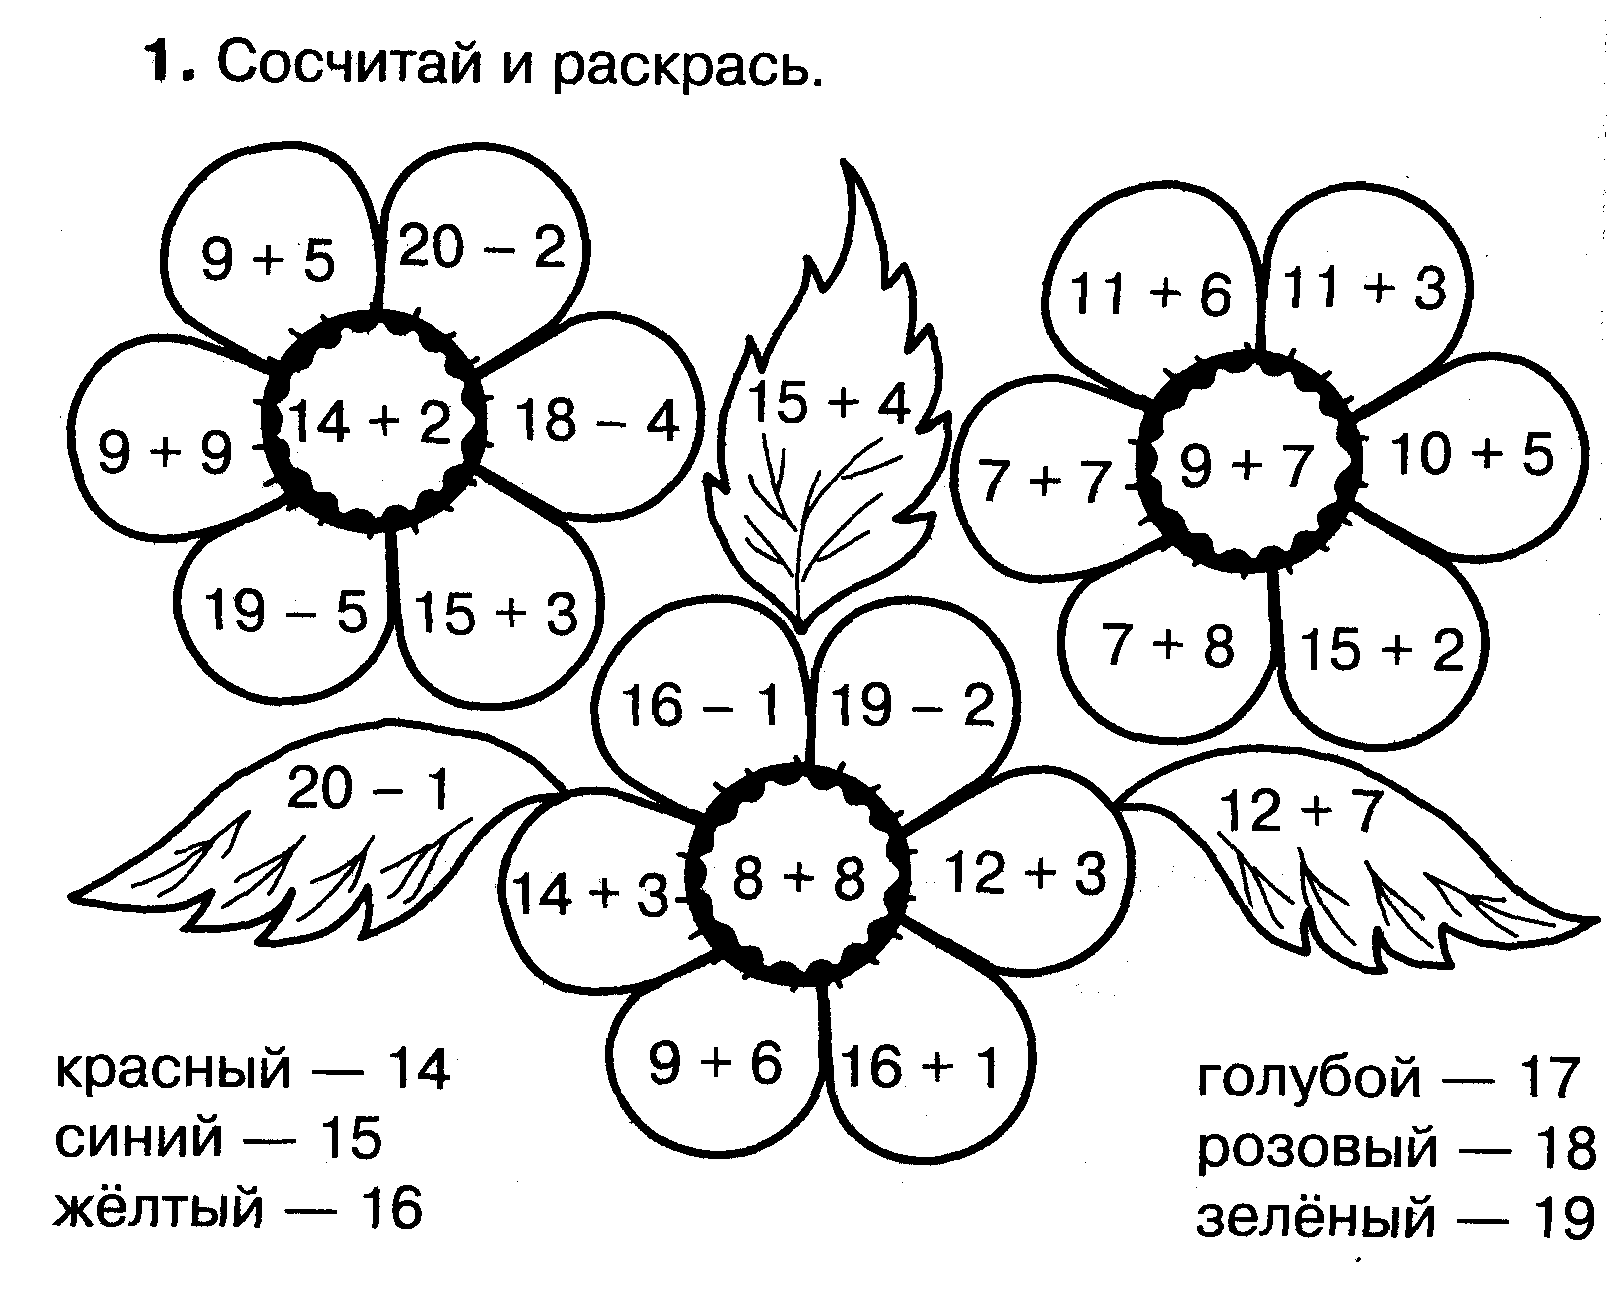 Математические раскраски с примерами в пределах 20